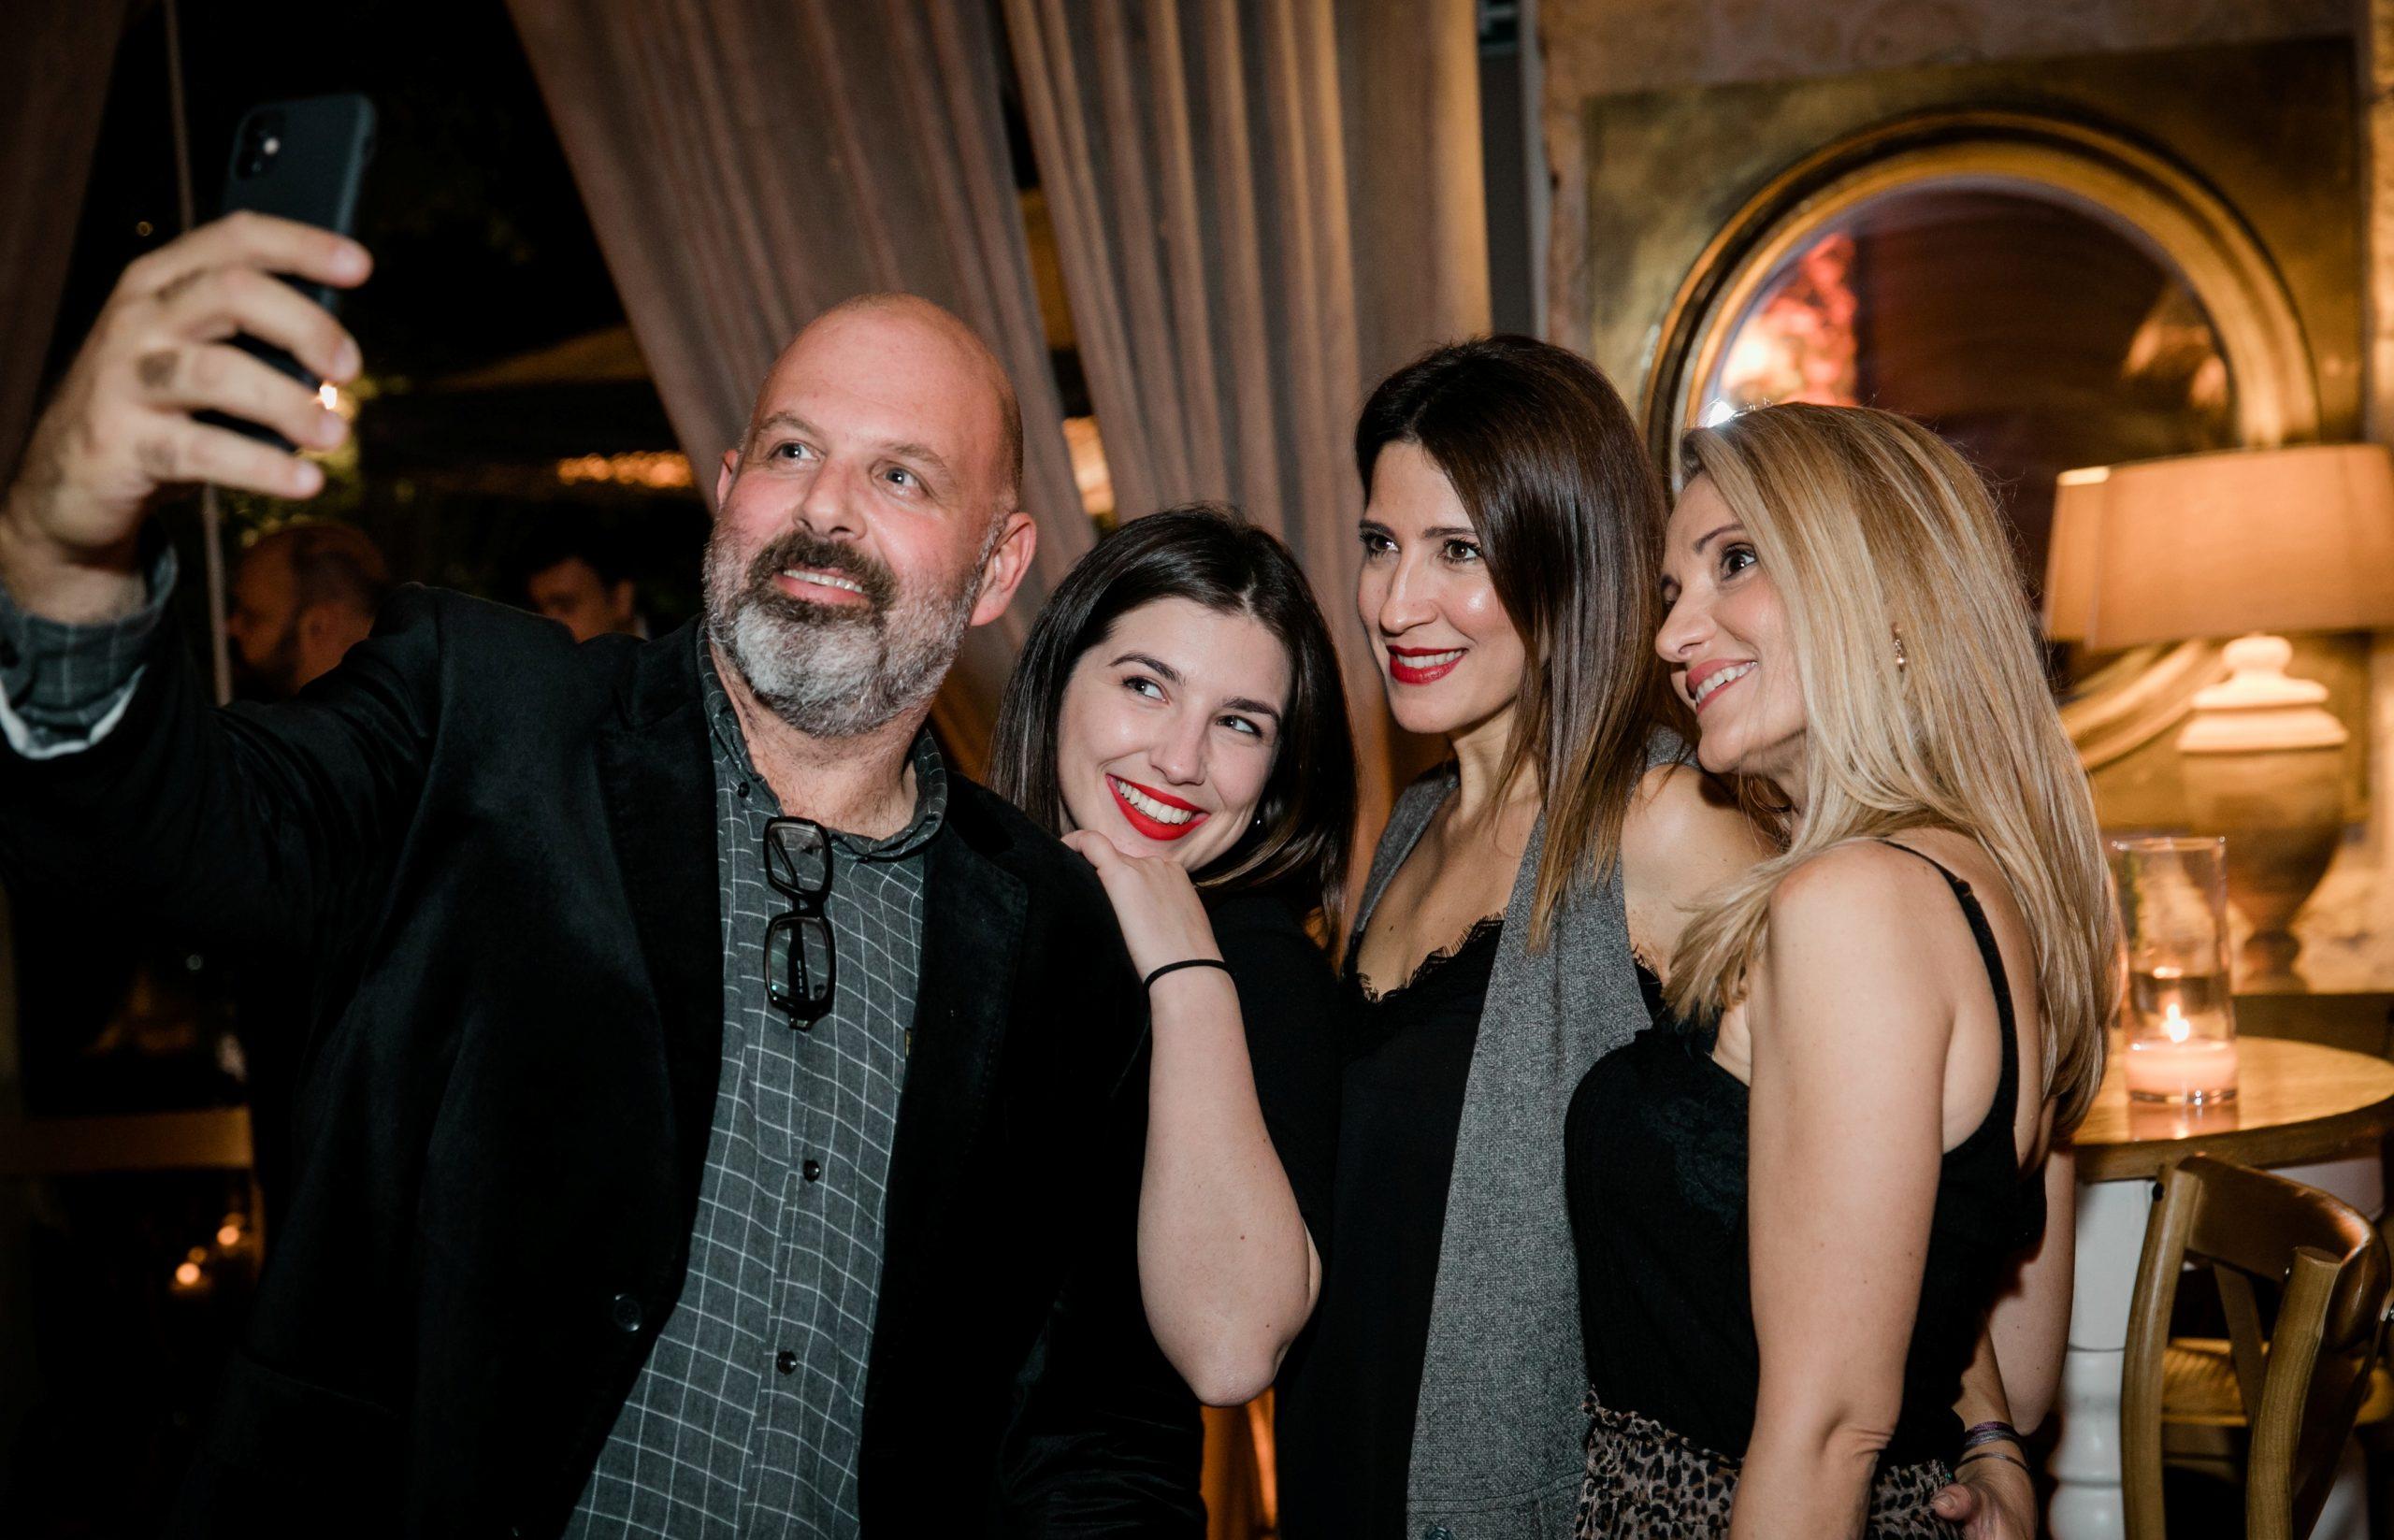 The beautiful people στο party από το Δειπνοσοφιστήριον